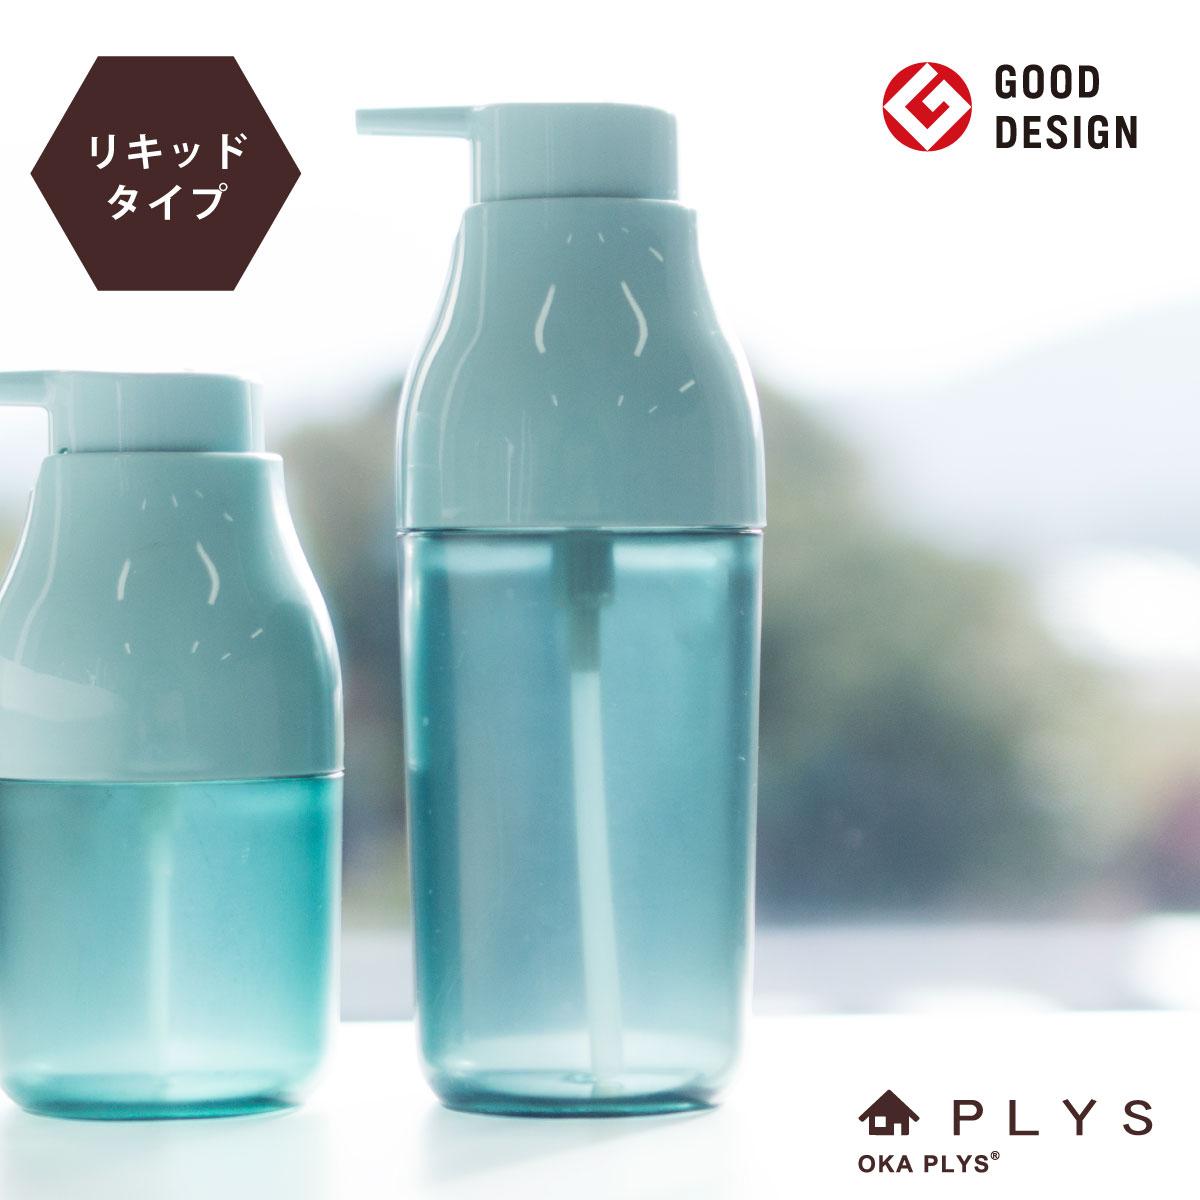 PLYS 国産品 base プリスベイス ディスペンサー リキッドタイプ リキッド 5%OFFクーポン 洗剤 おしゃれ 15日 シャンプー 人気の定番 ハンドソープ